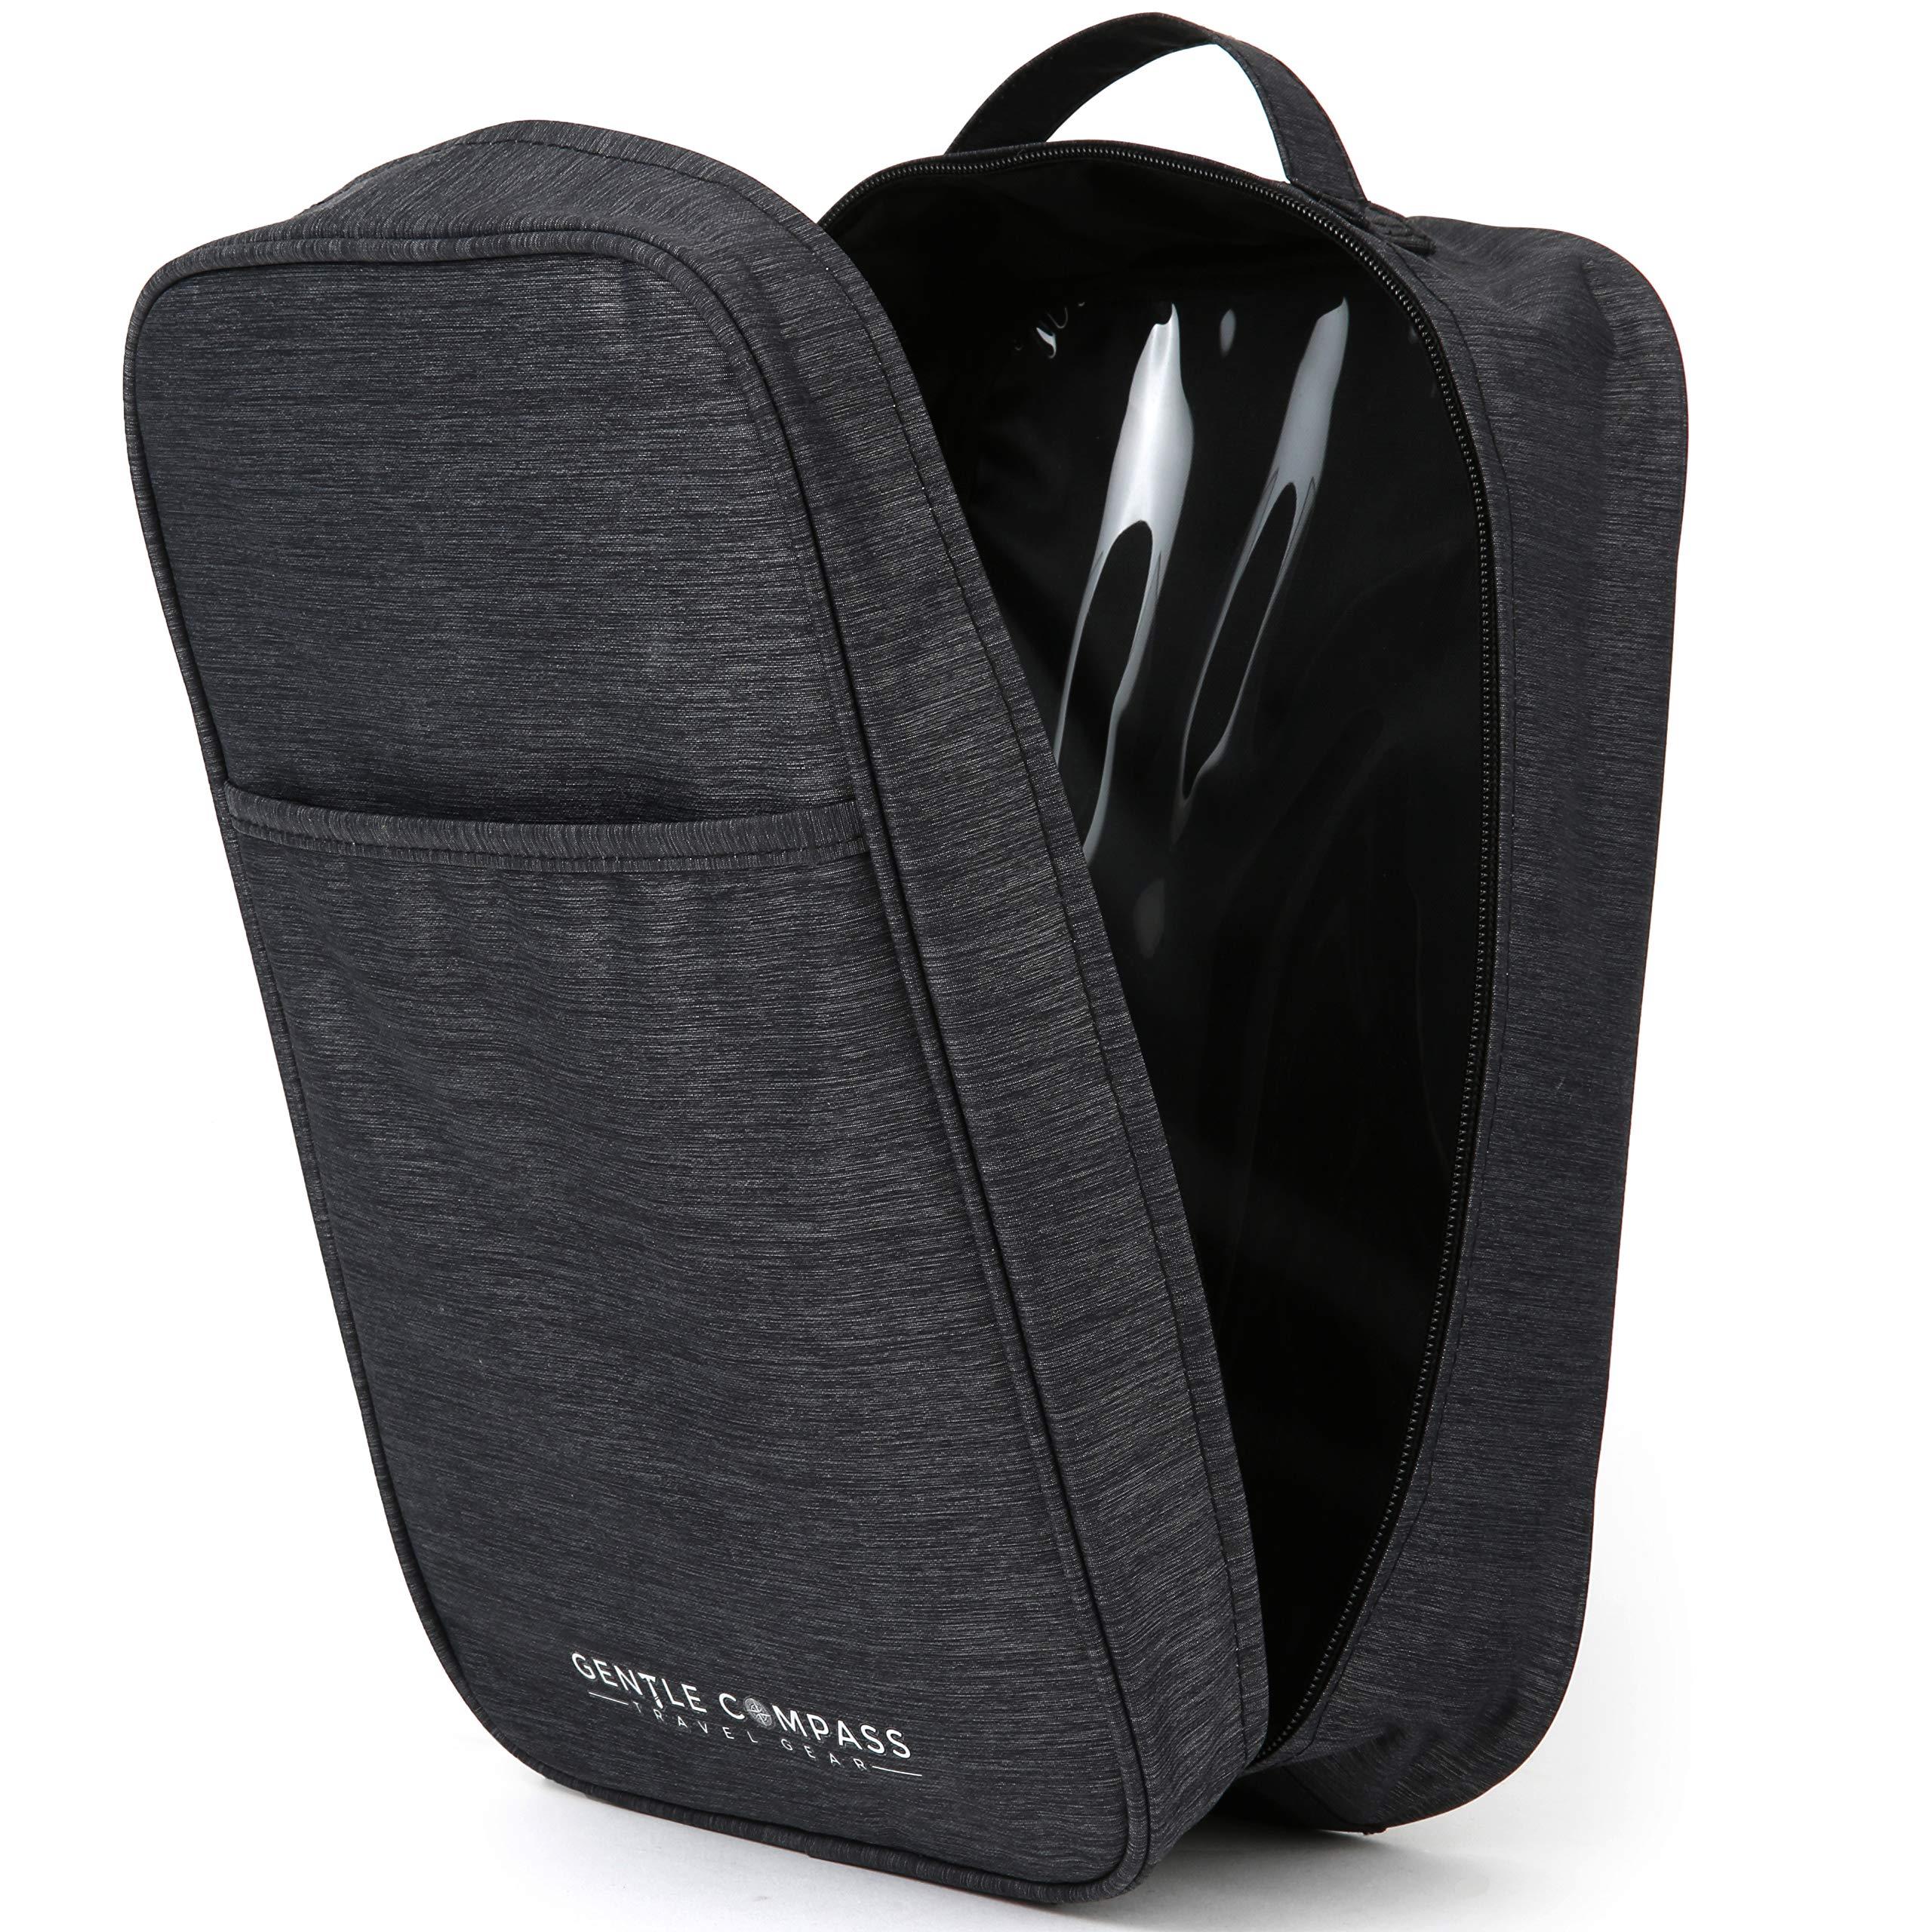 Durable Travel Shoe Bag by Gentle Compass Waterproof with Zipper for Men & Women by Gentle Compass